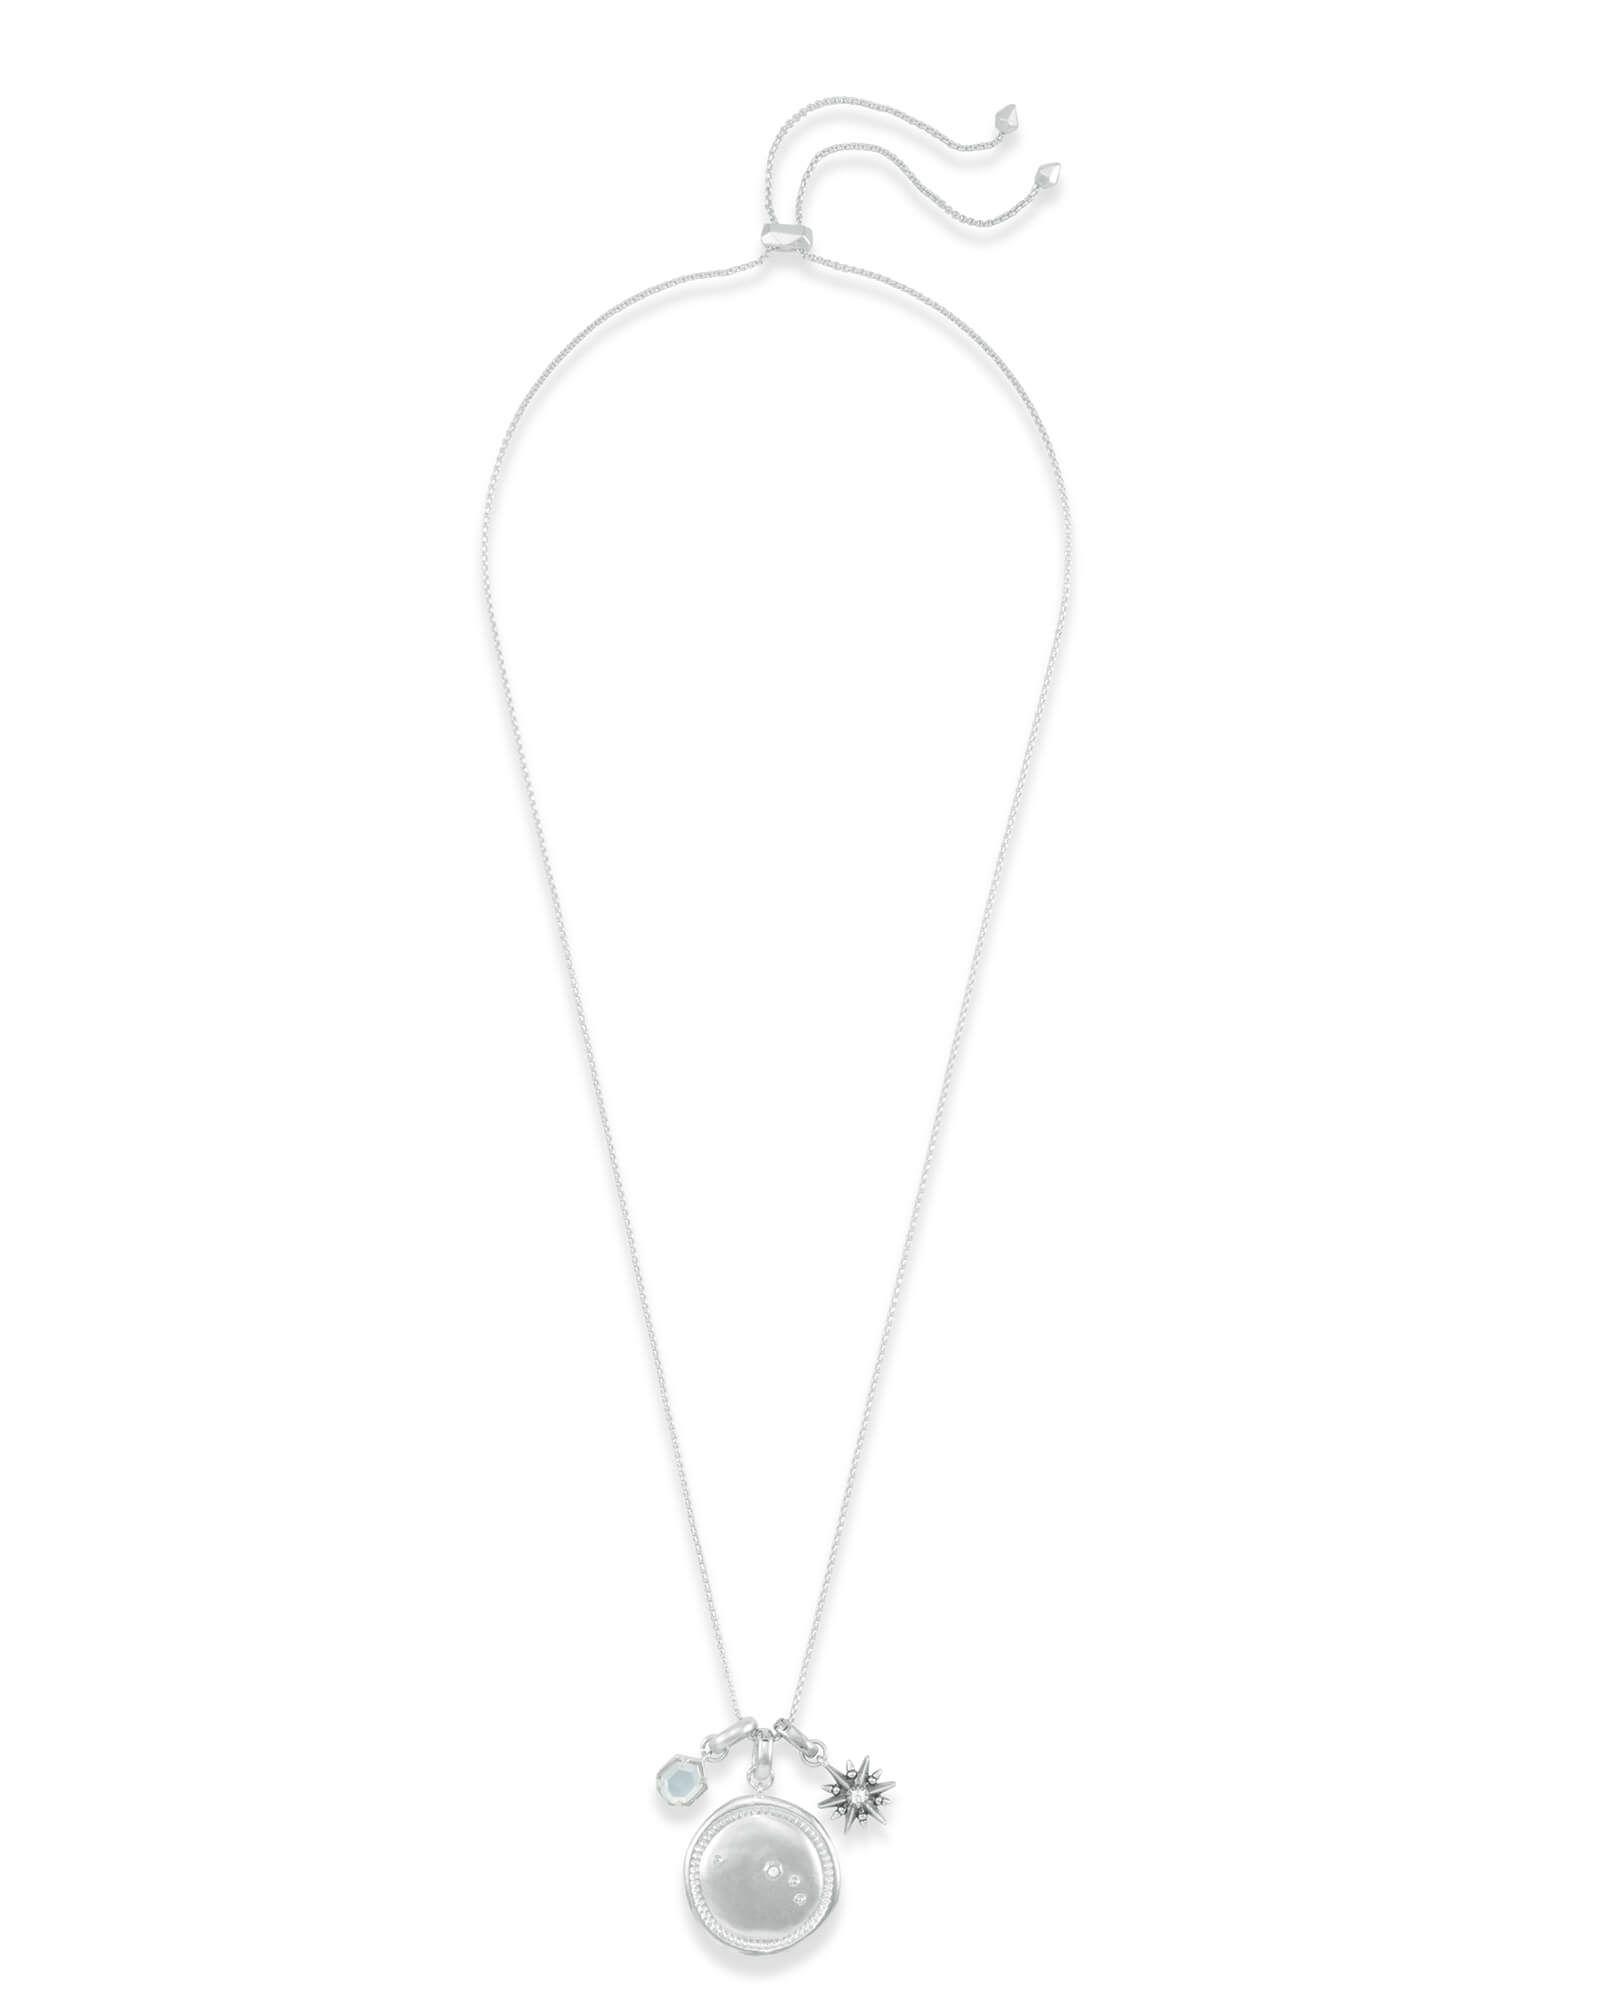 Kendra Scott Light Blue Illusion Necklace